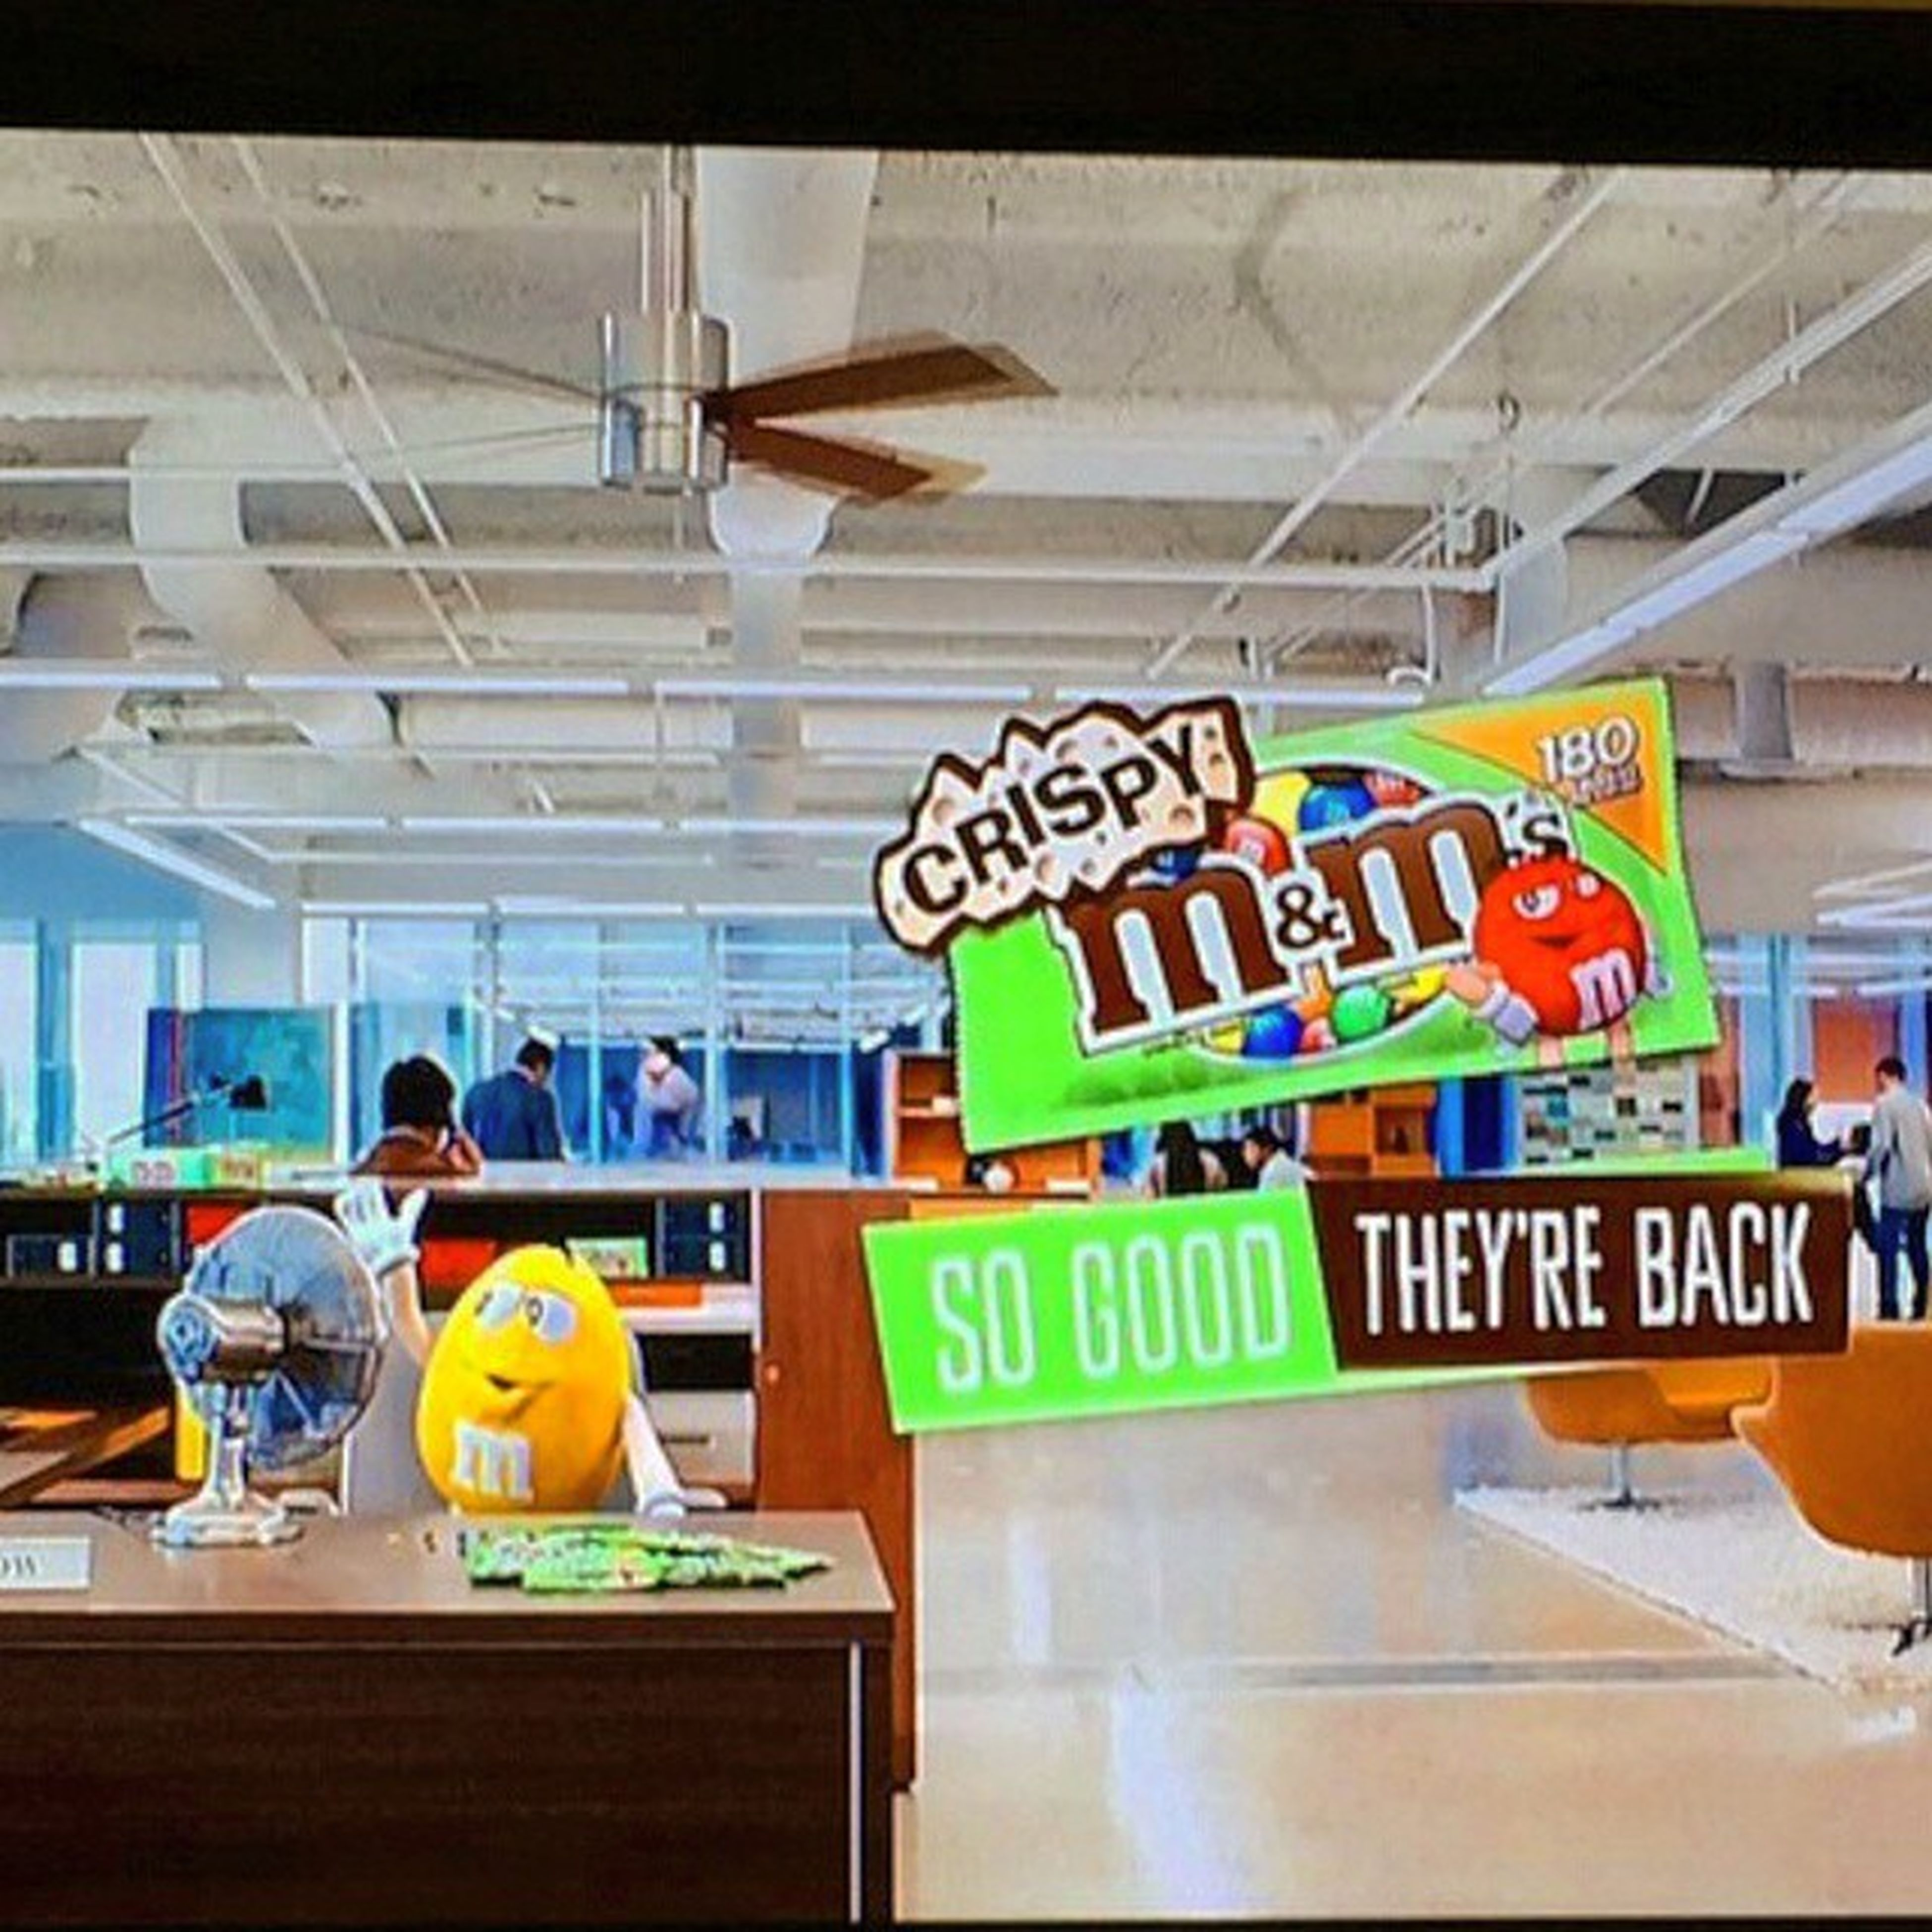 Hands down my favorite commercial right now ! Go get some crispy M&M.. ⭕Commericals Lifeisbetterincolor Chocolate Crispy crispymm mandm yellow fans CrispyMnMAREback!!! favoritecommerical havingamoment littlekidstatus theyreback